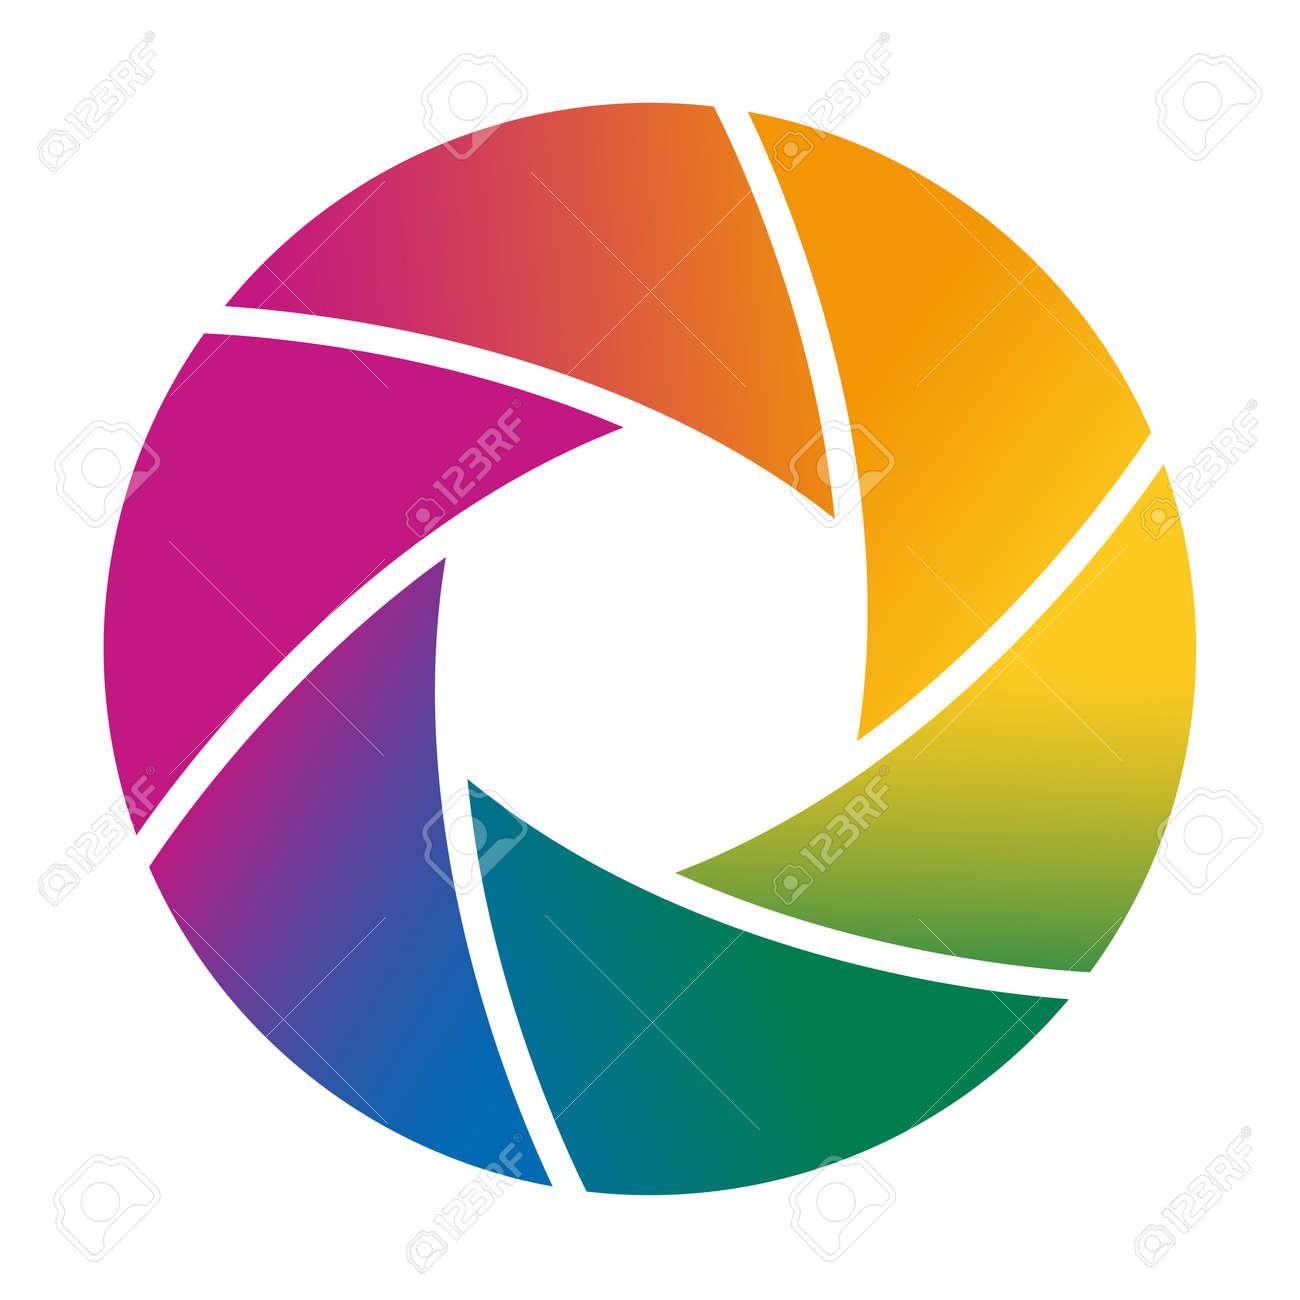 colorful camera shutter vector illustration royalty free cliparts rh 123rf com shutter vector free shutter vector free